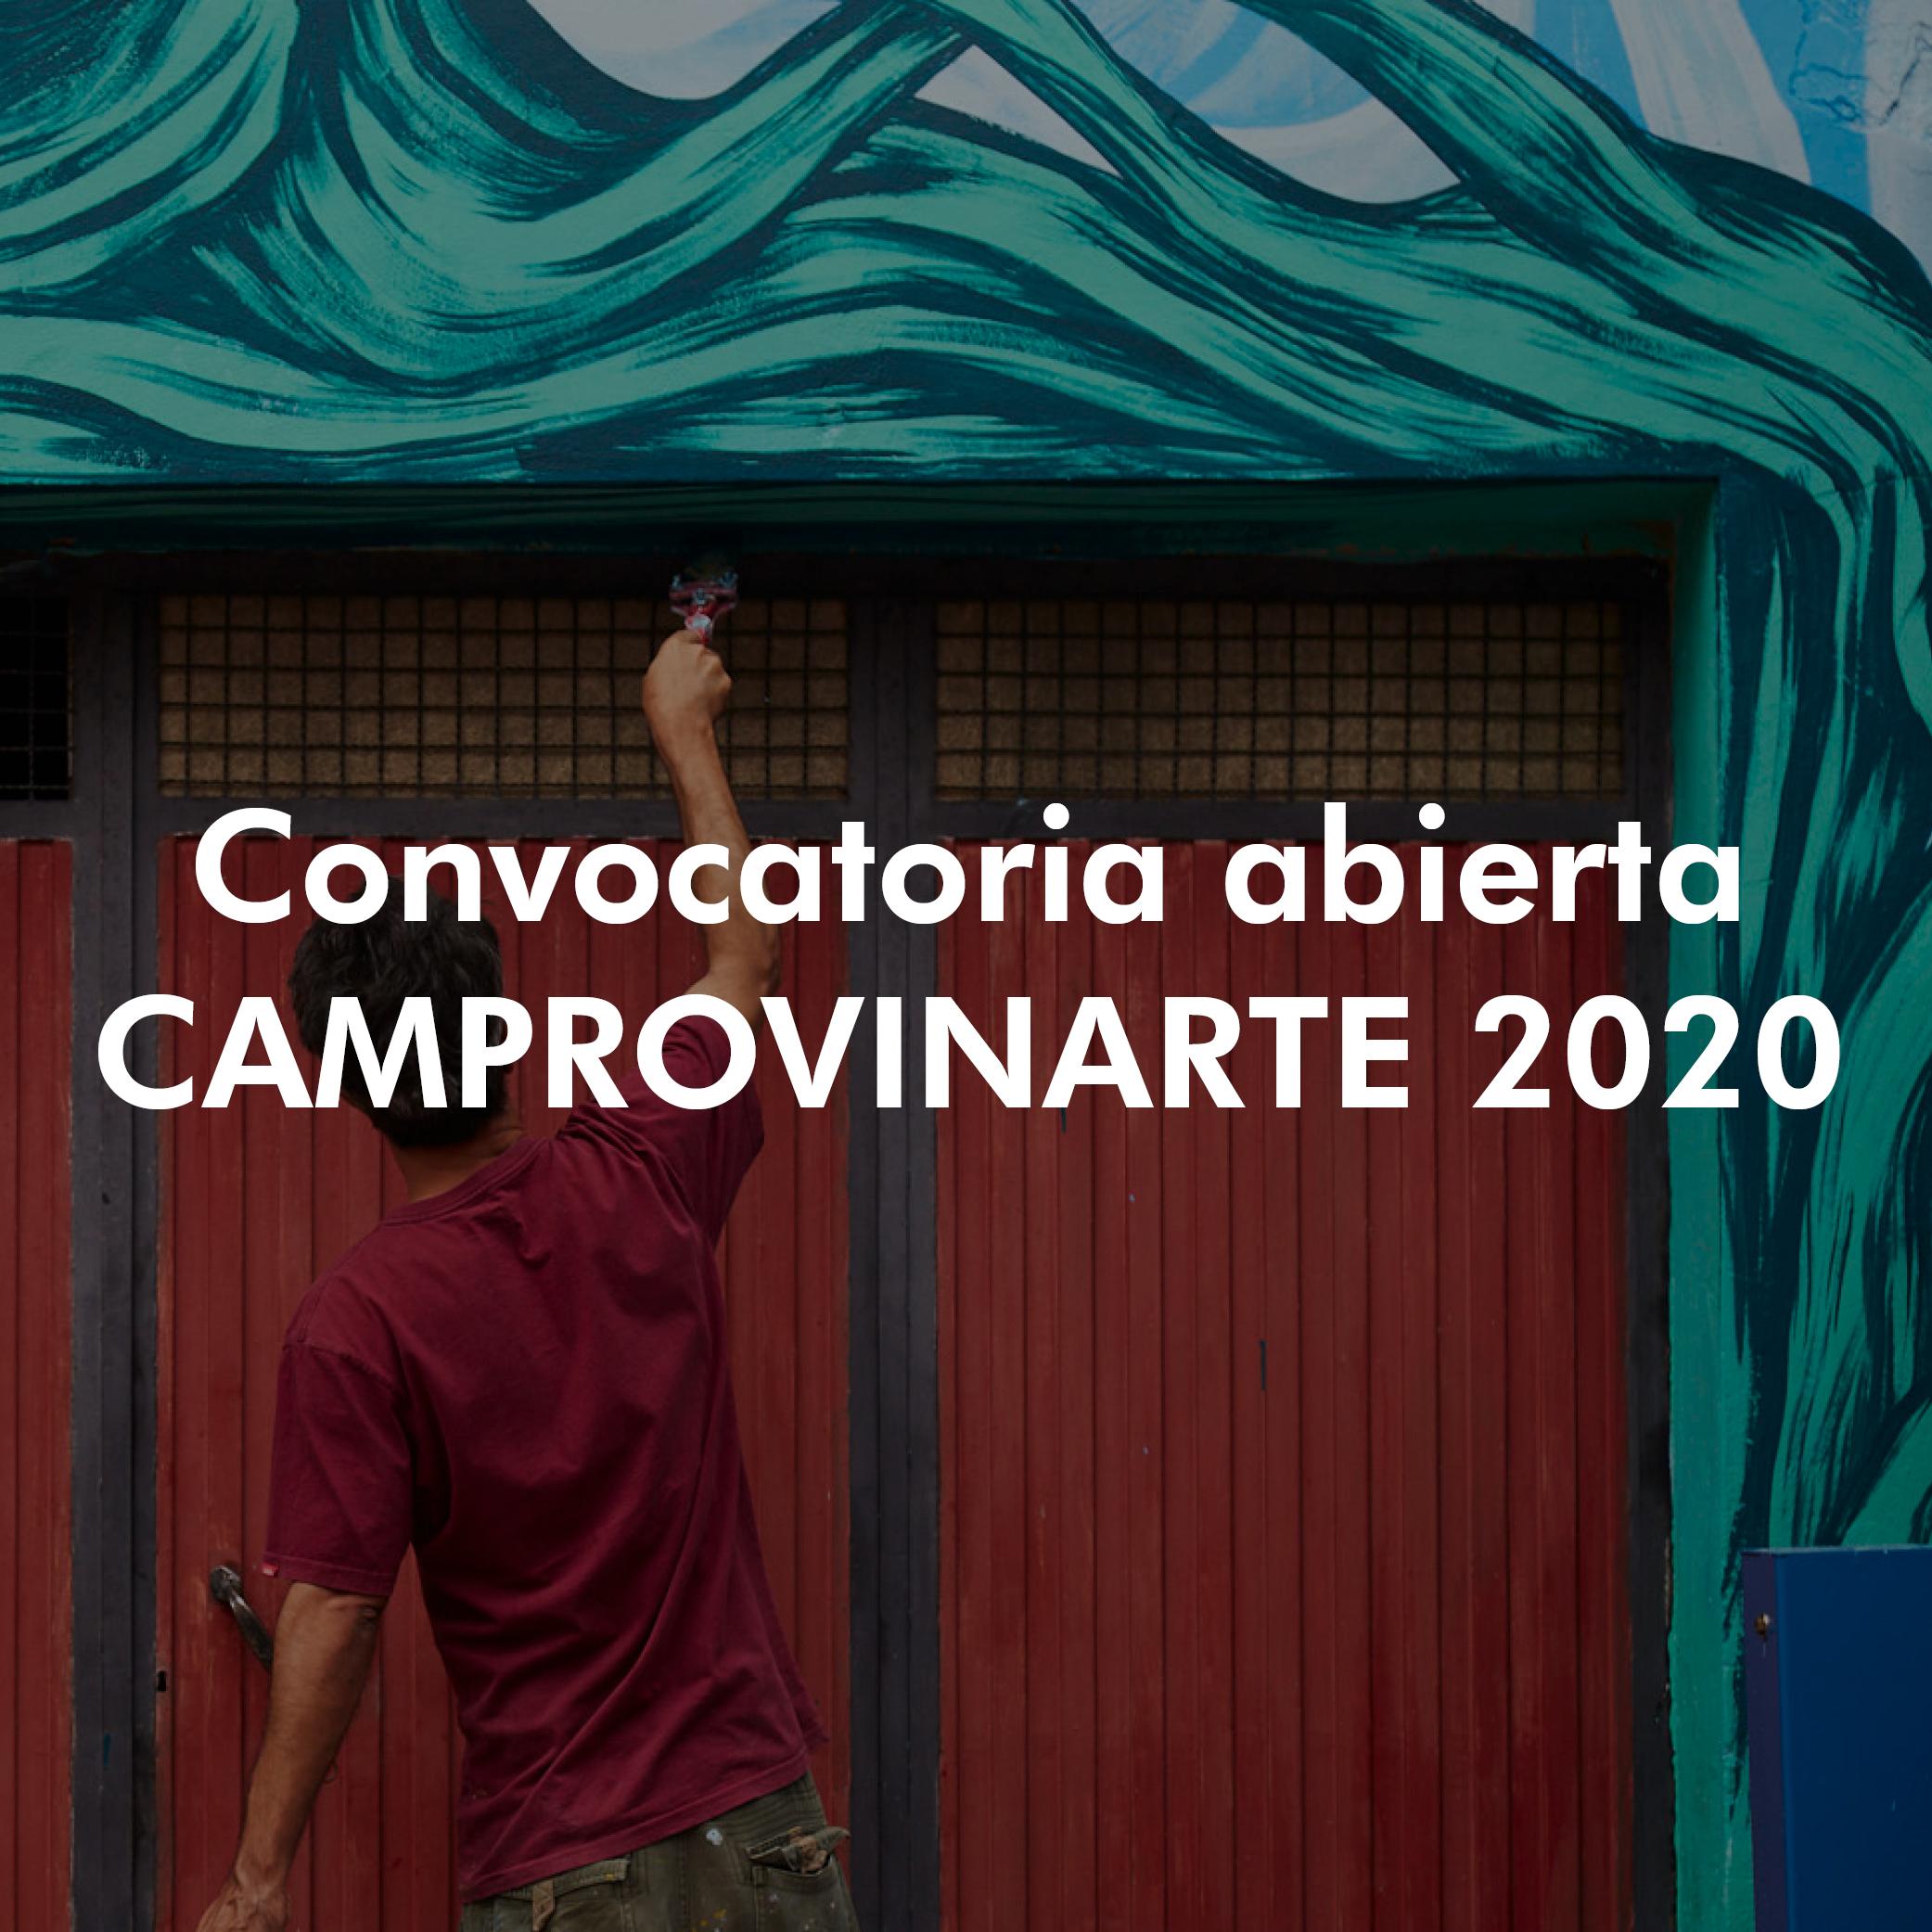 Convocatoria abierta Camprovinarte 2020